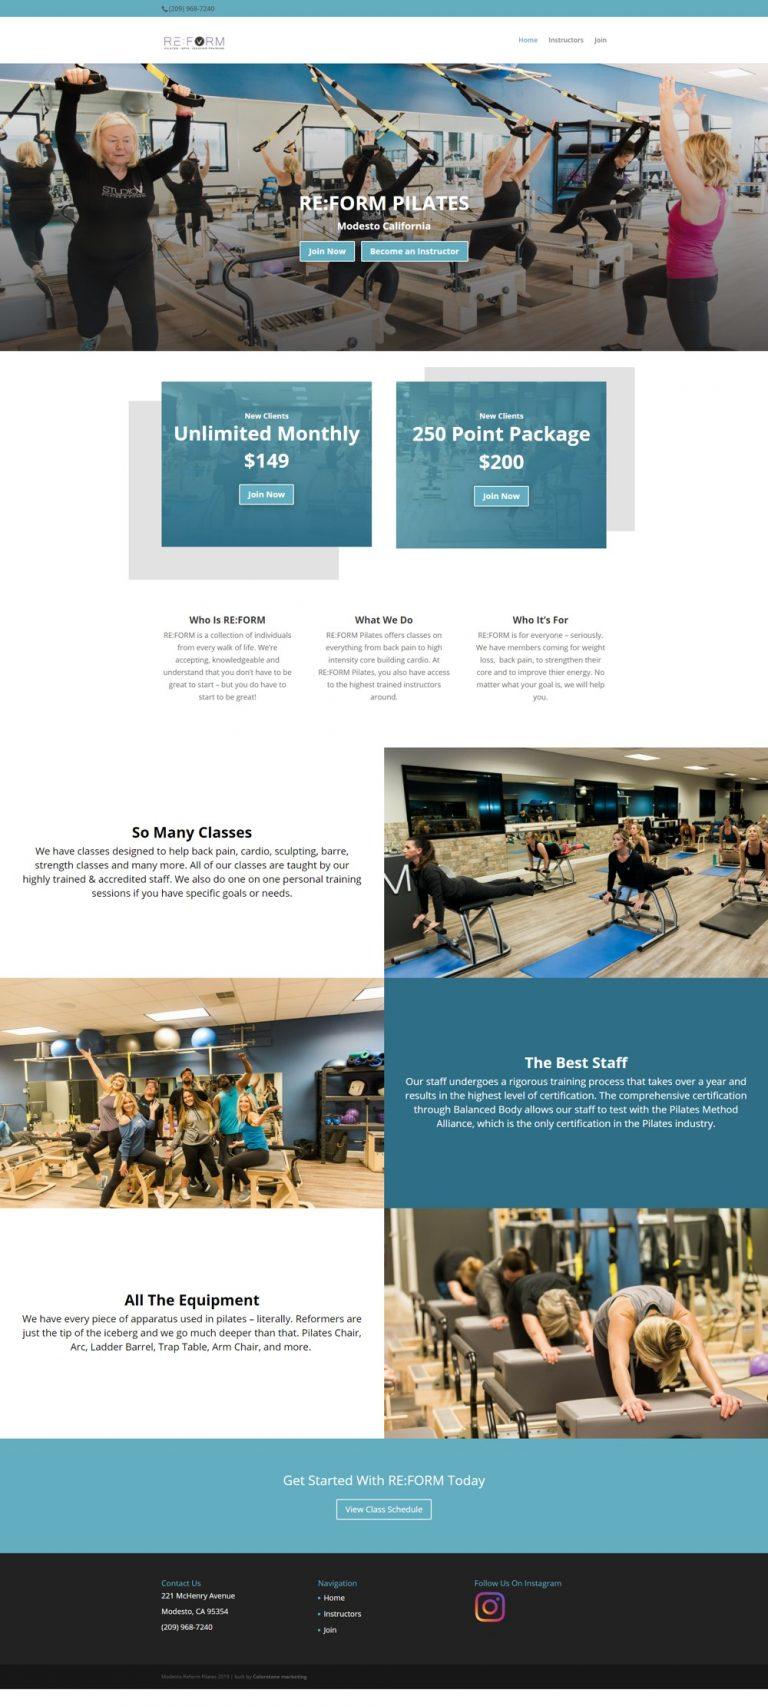 Modesto reform home page